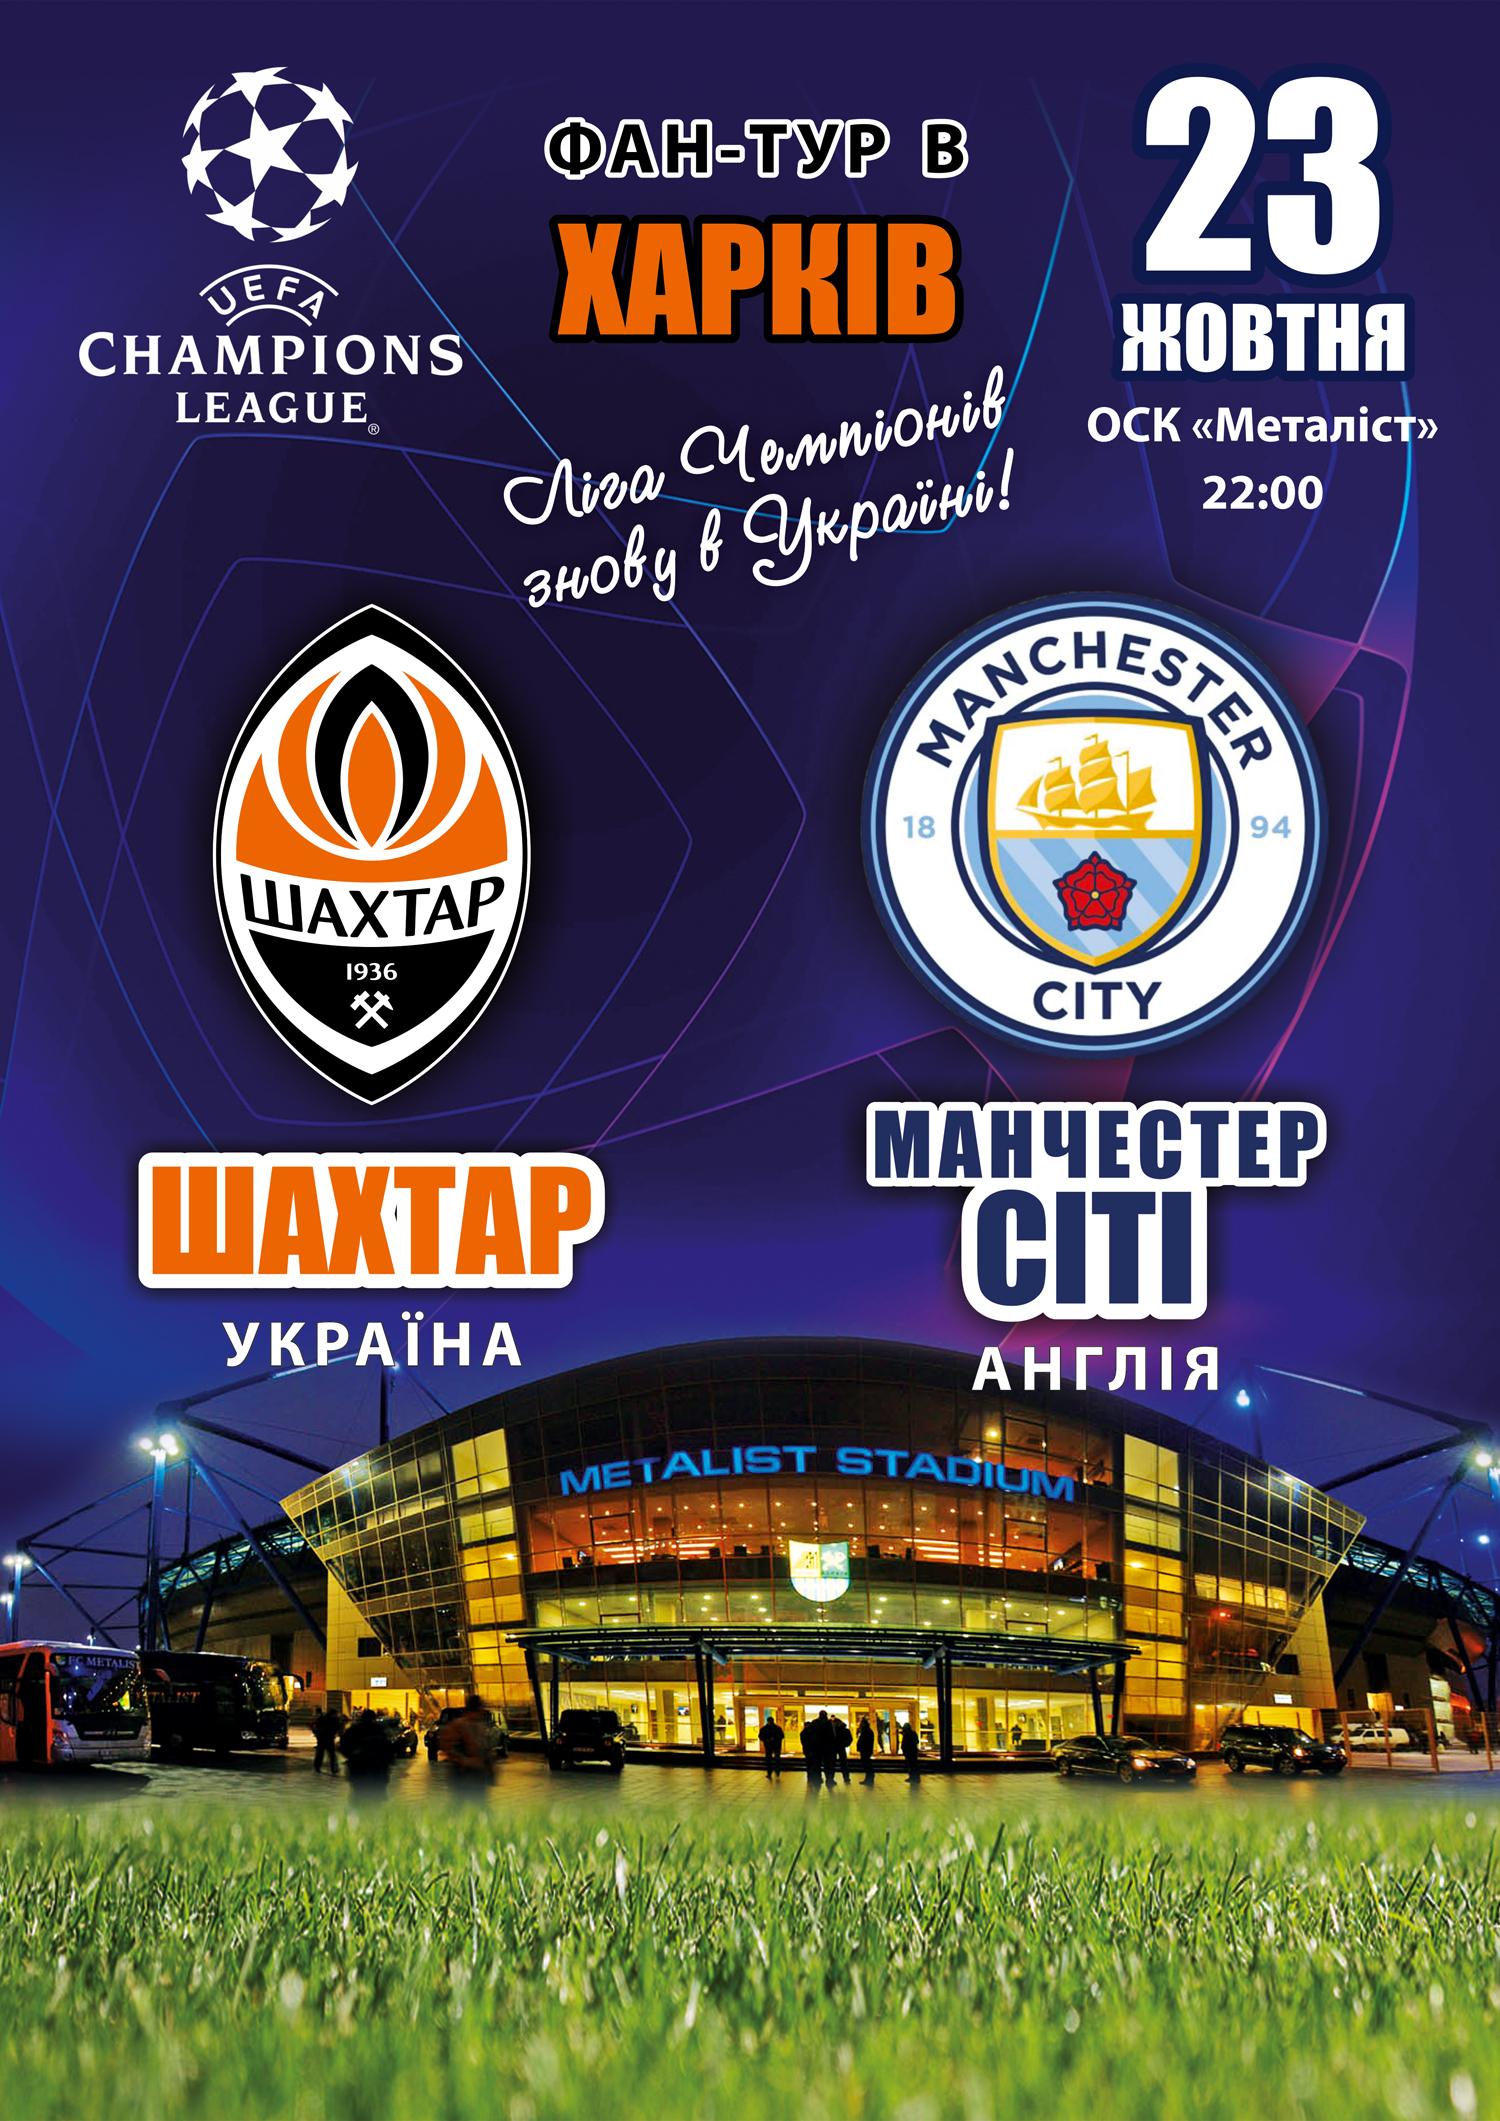 Фан-тур на матч Лиги Чемпионов Шахтер–Манчестер Сити (Днепр)